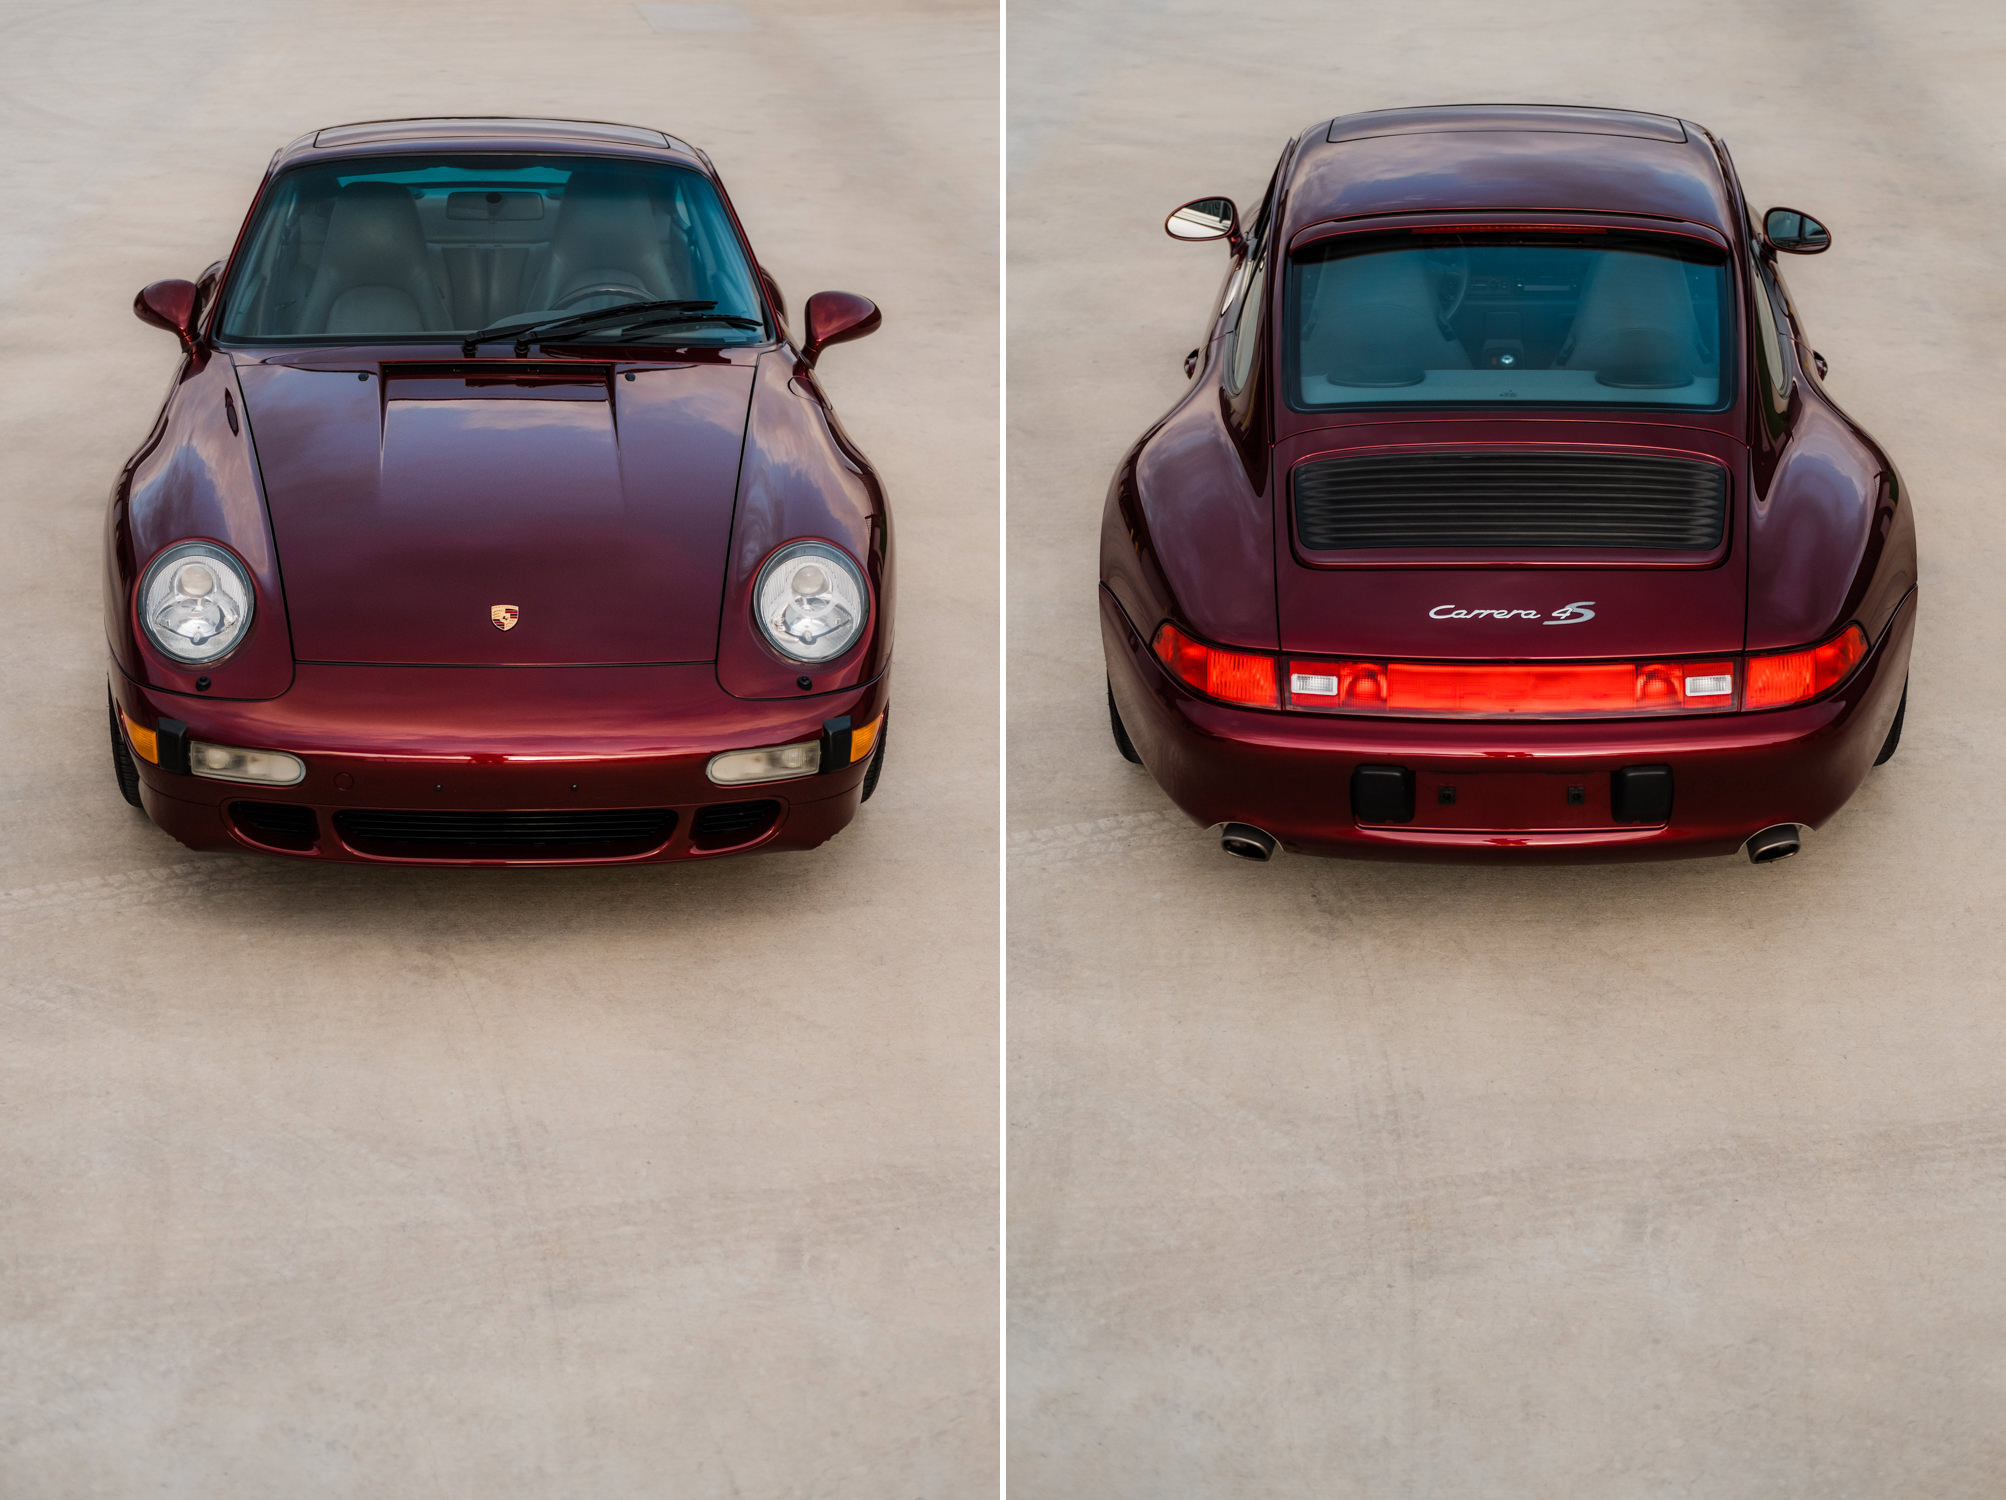 Porsche 911 Carrera 4S-Porsche 993-Porsche 911-Paint Correction-Car Wash-Car Detailing-106.jpg